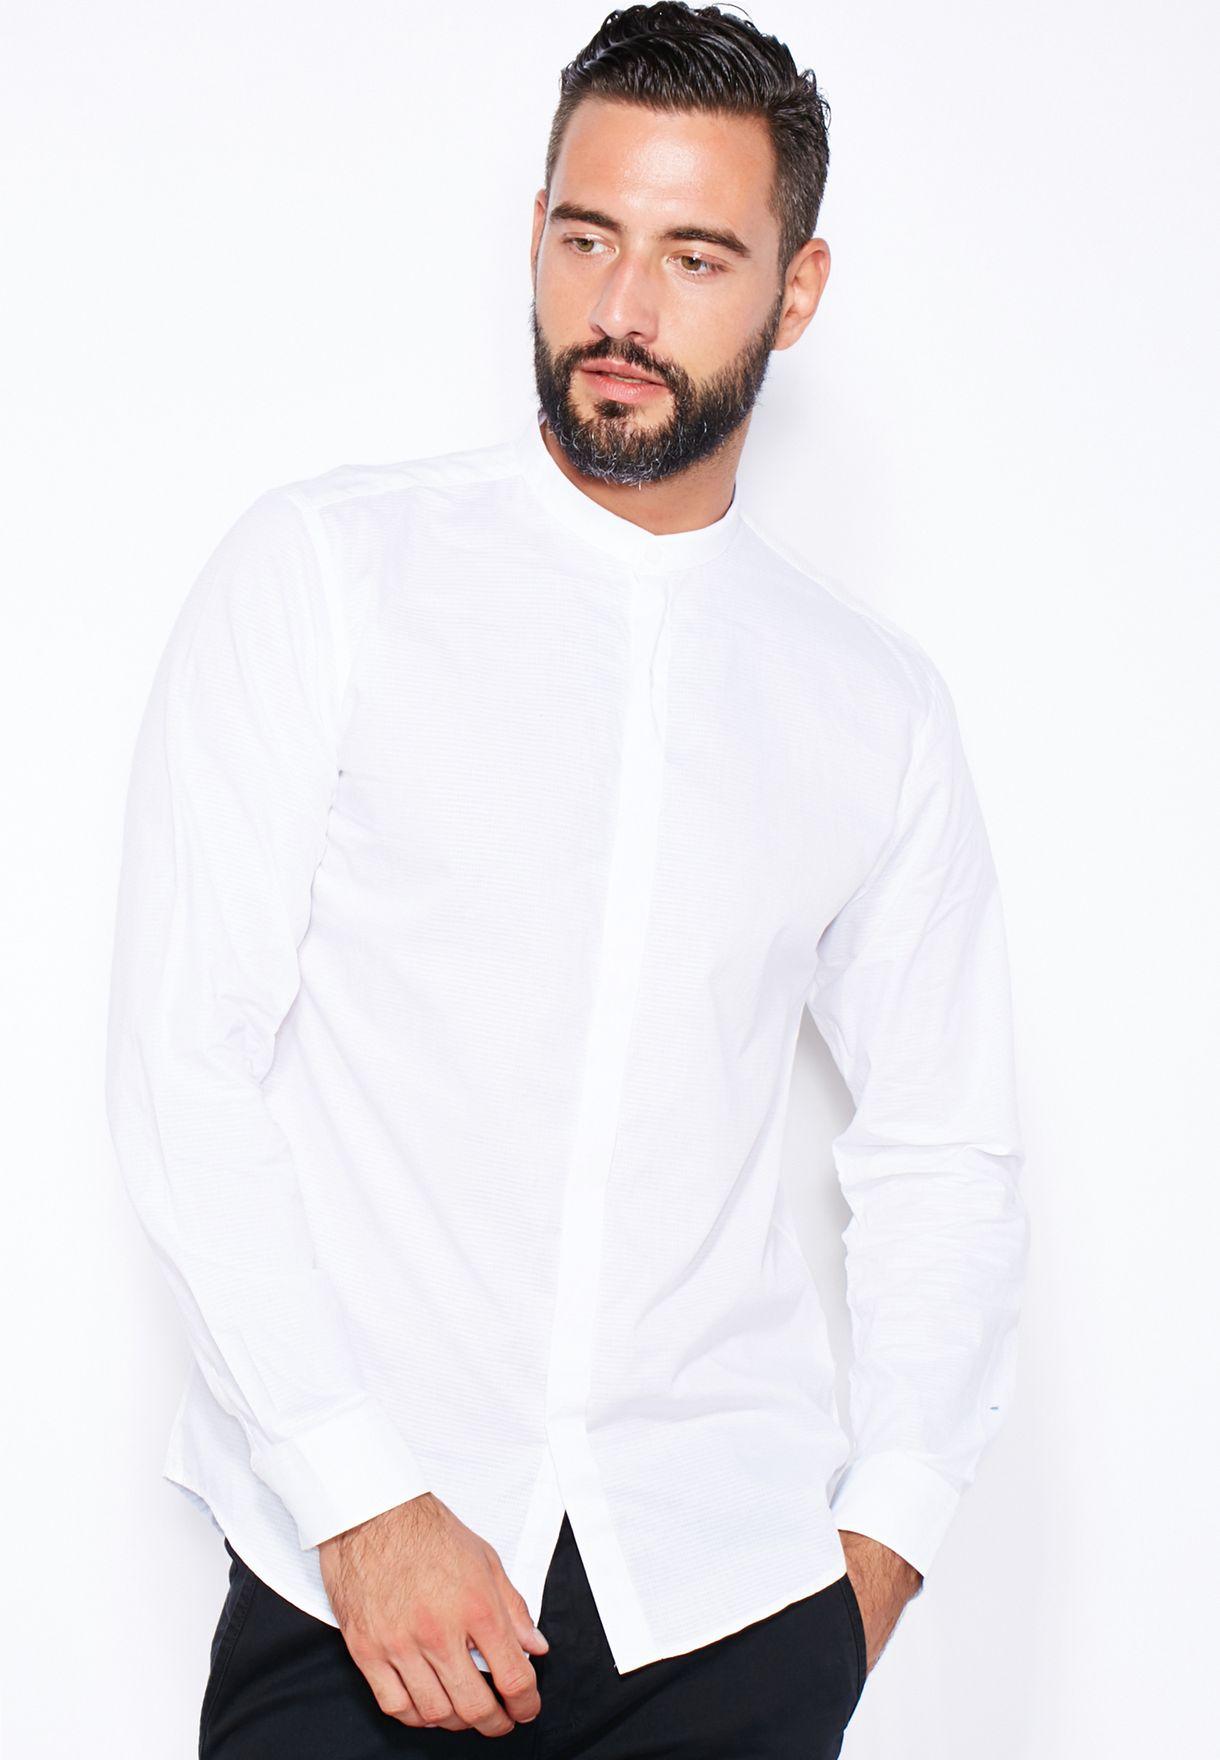 7b6aa260391f2 تسوق قميص بياقة صينية ماركة سيليكتد هومي لون أبيض في جميع الدول ...